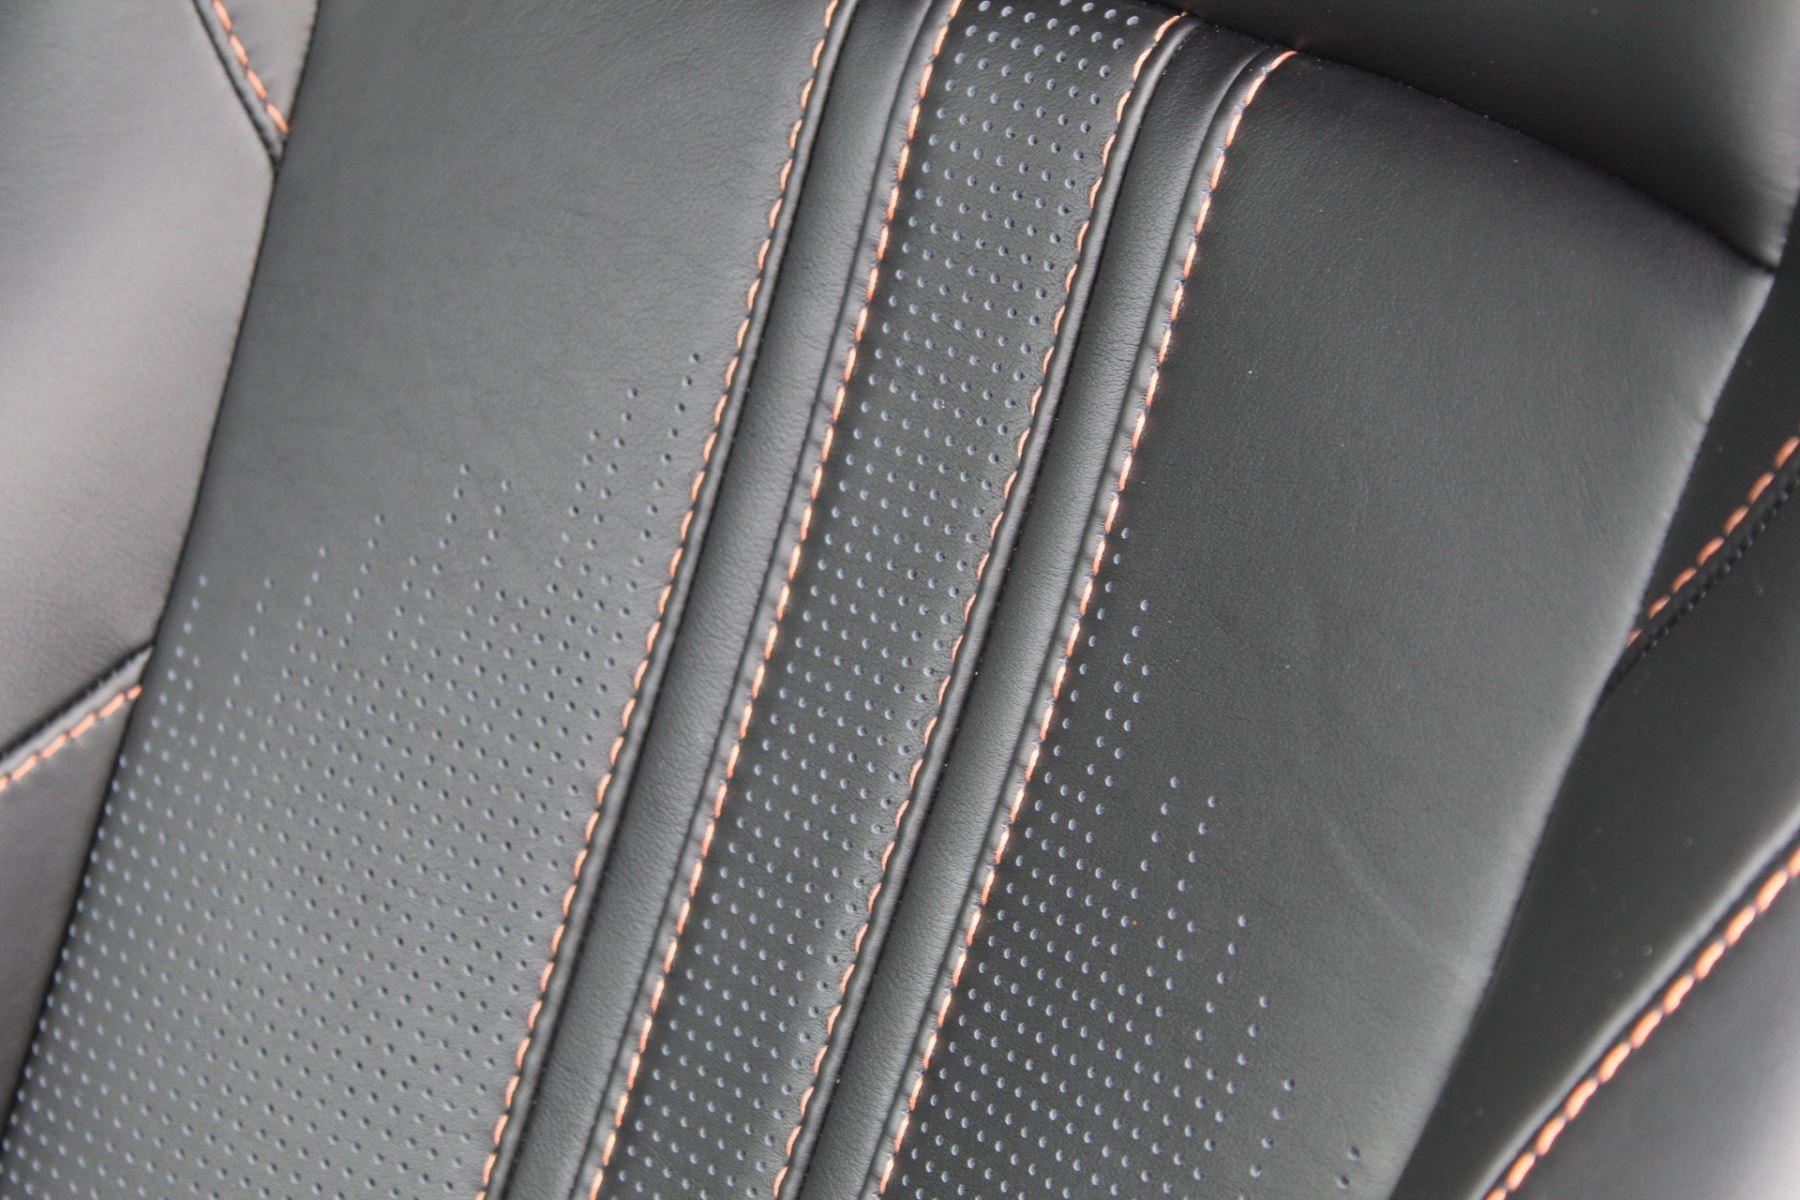 Aston Martin New Vantage 2dr ZF 8 Speed image 15